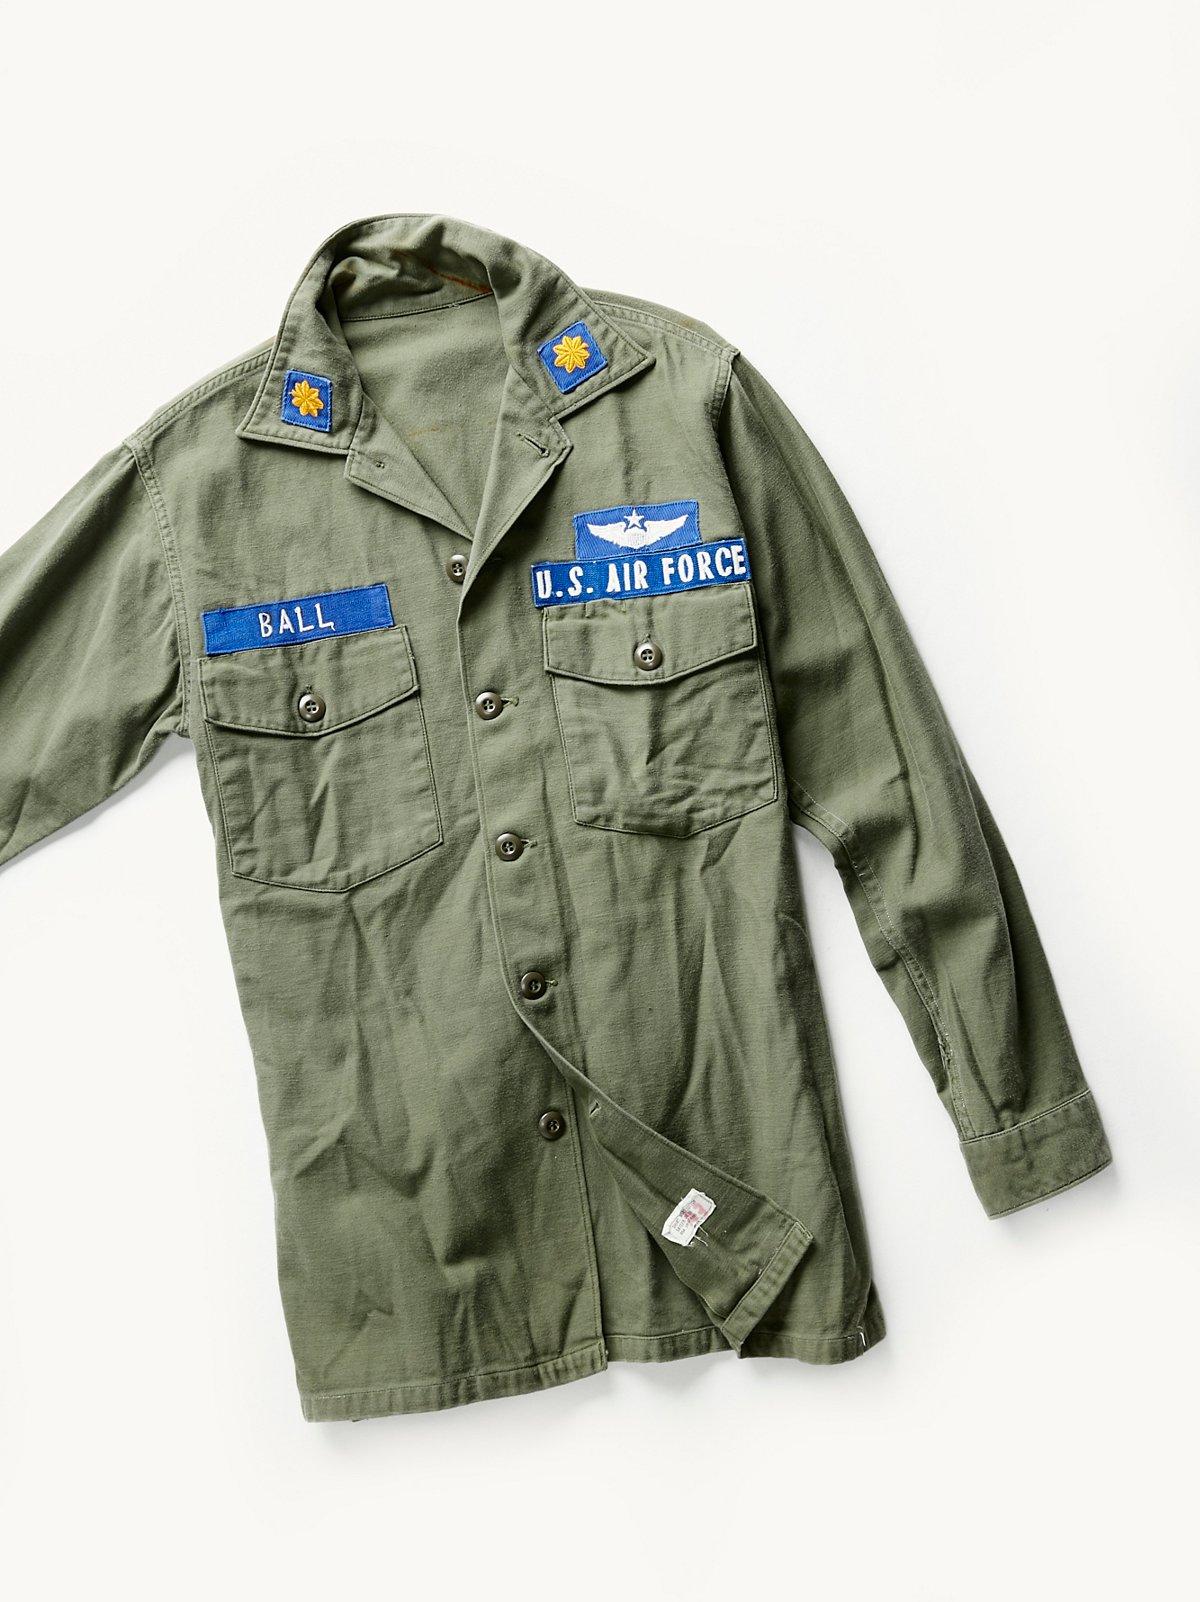 Vintage 1970s Military Shirt